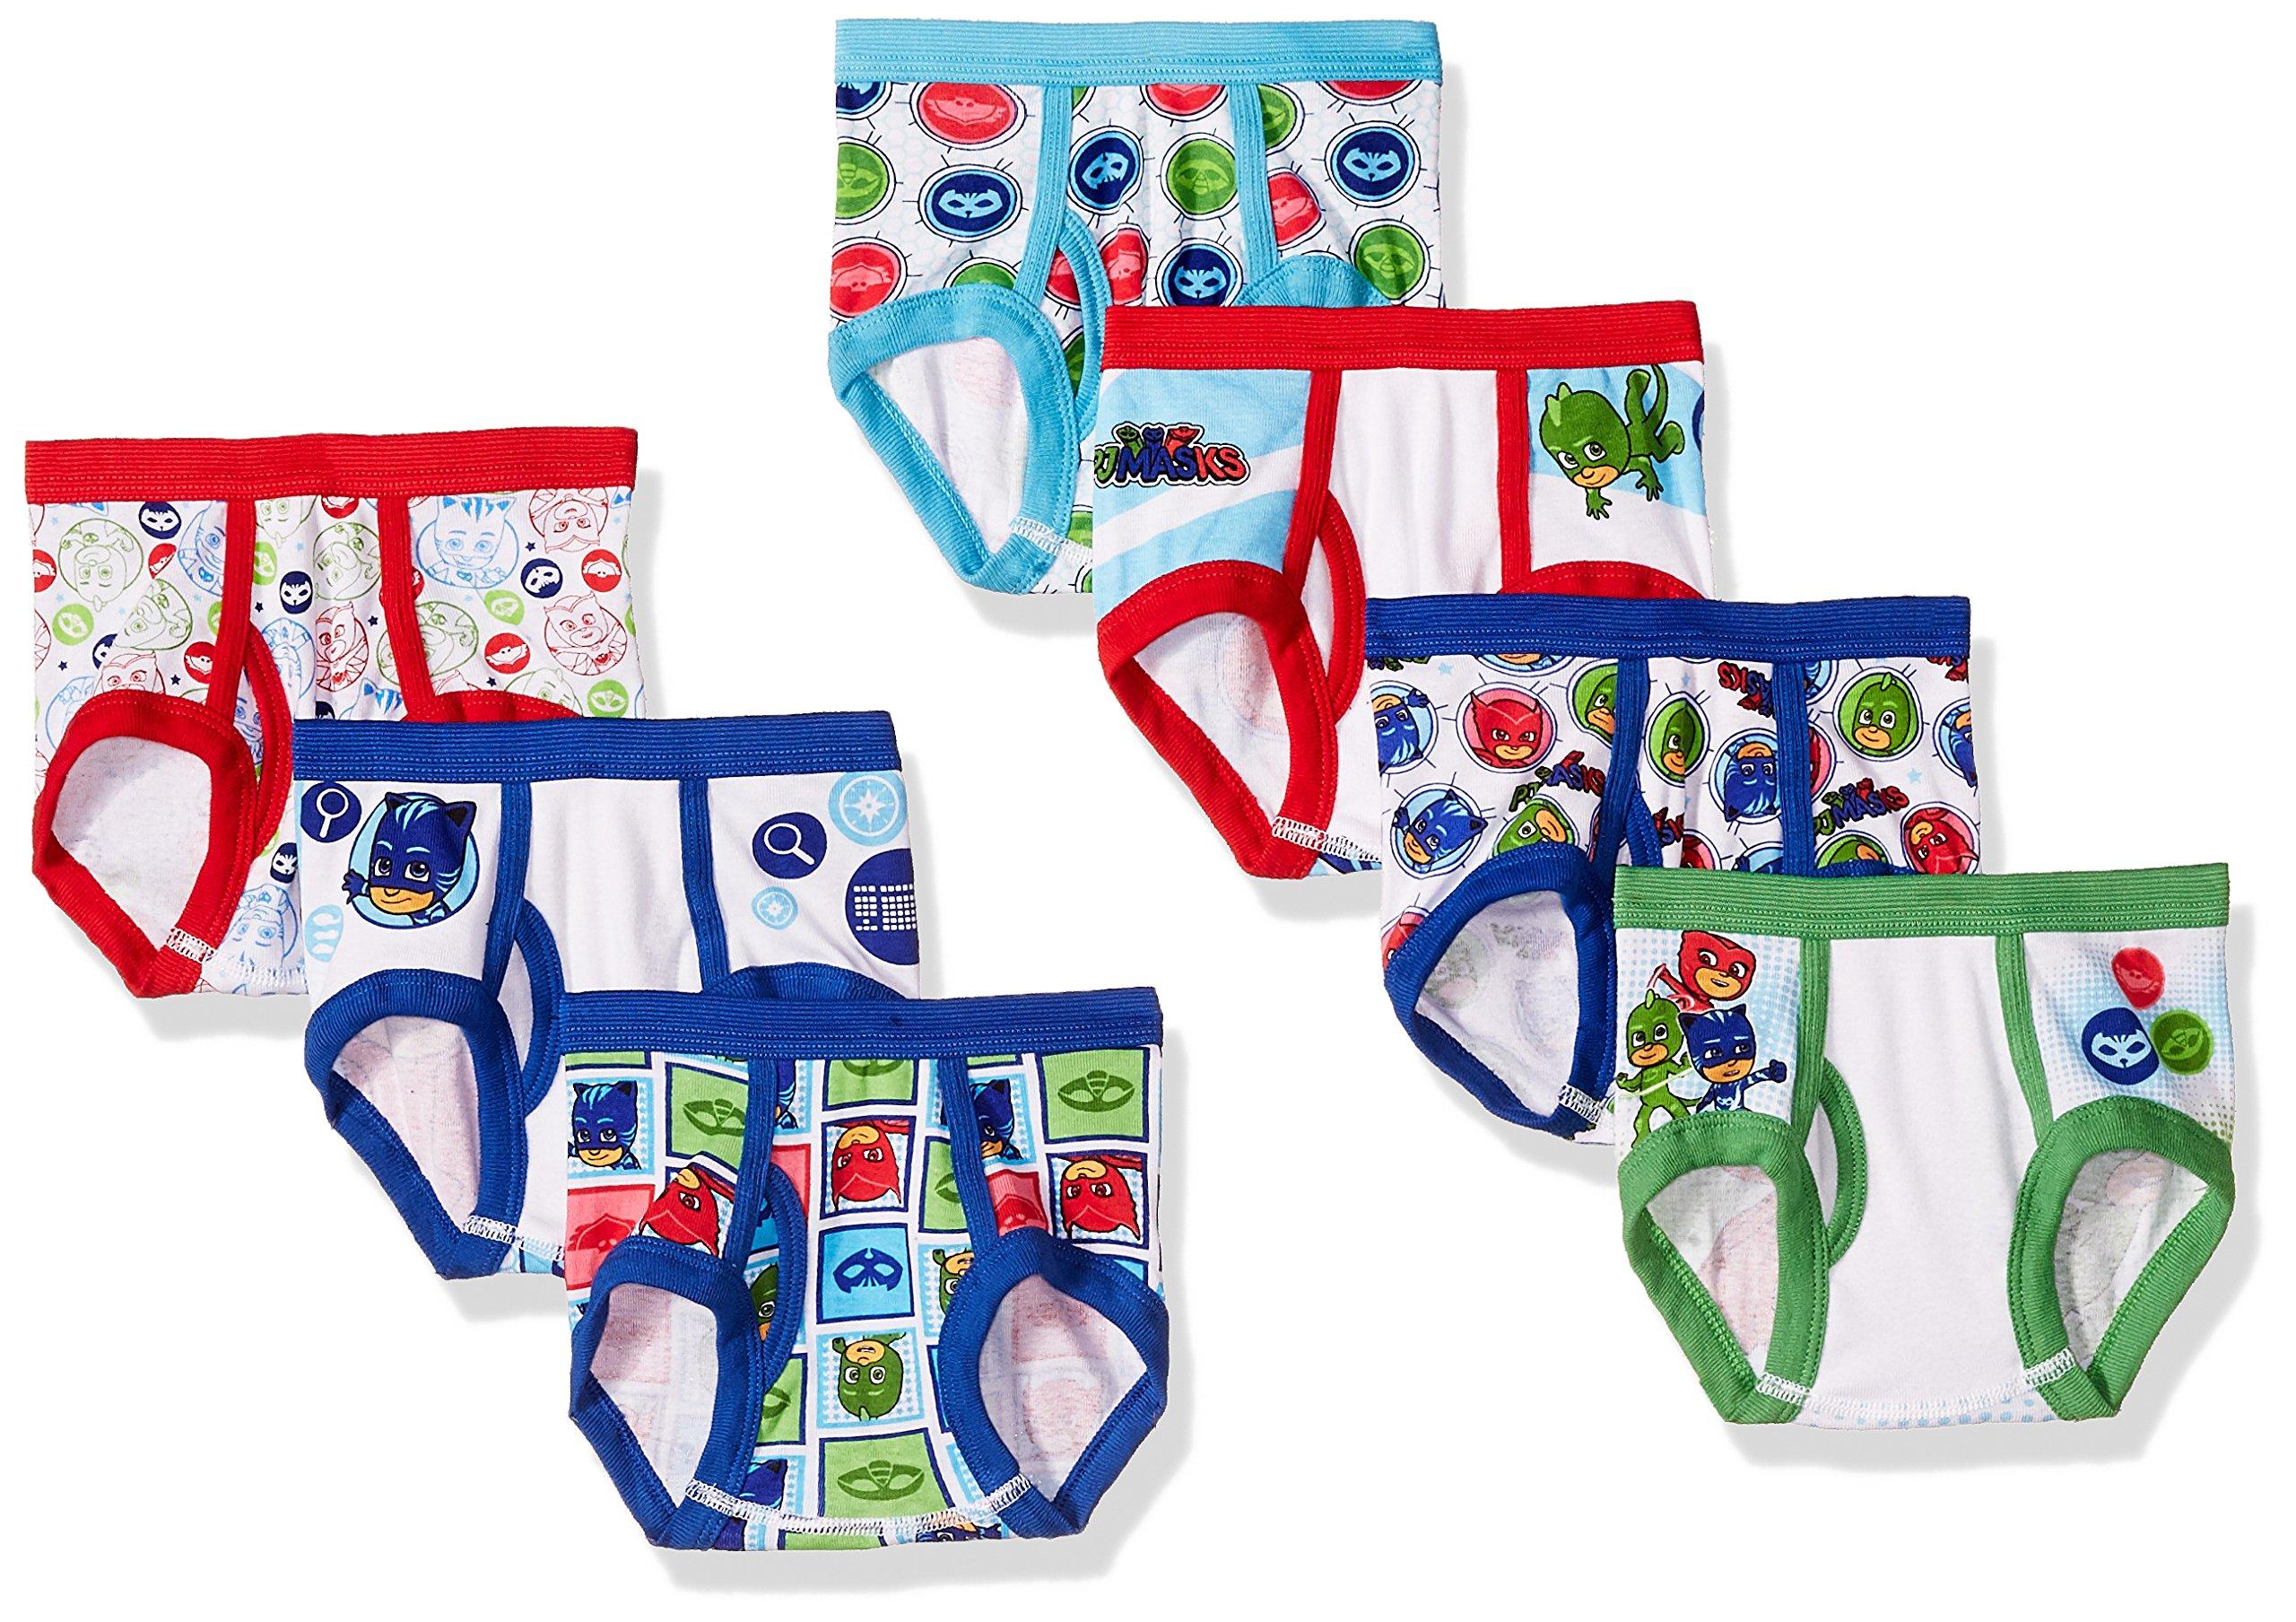 PJ Masks Toddler Boys' 7-Pack Brief Underwear, PJ Mask Tboy-Multi, 4T